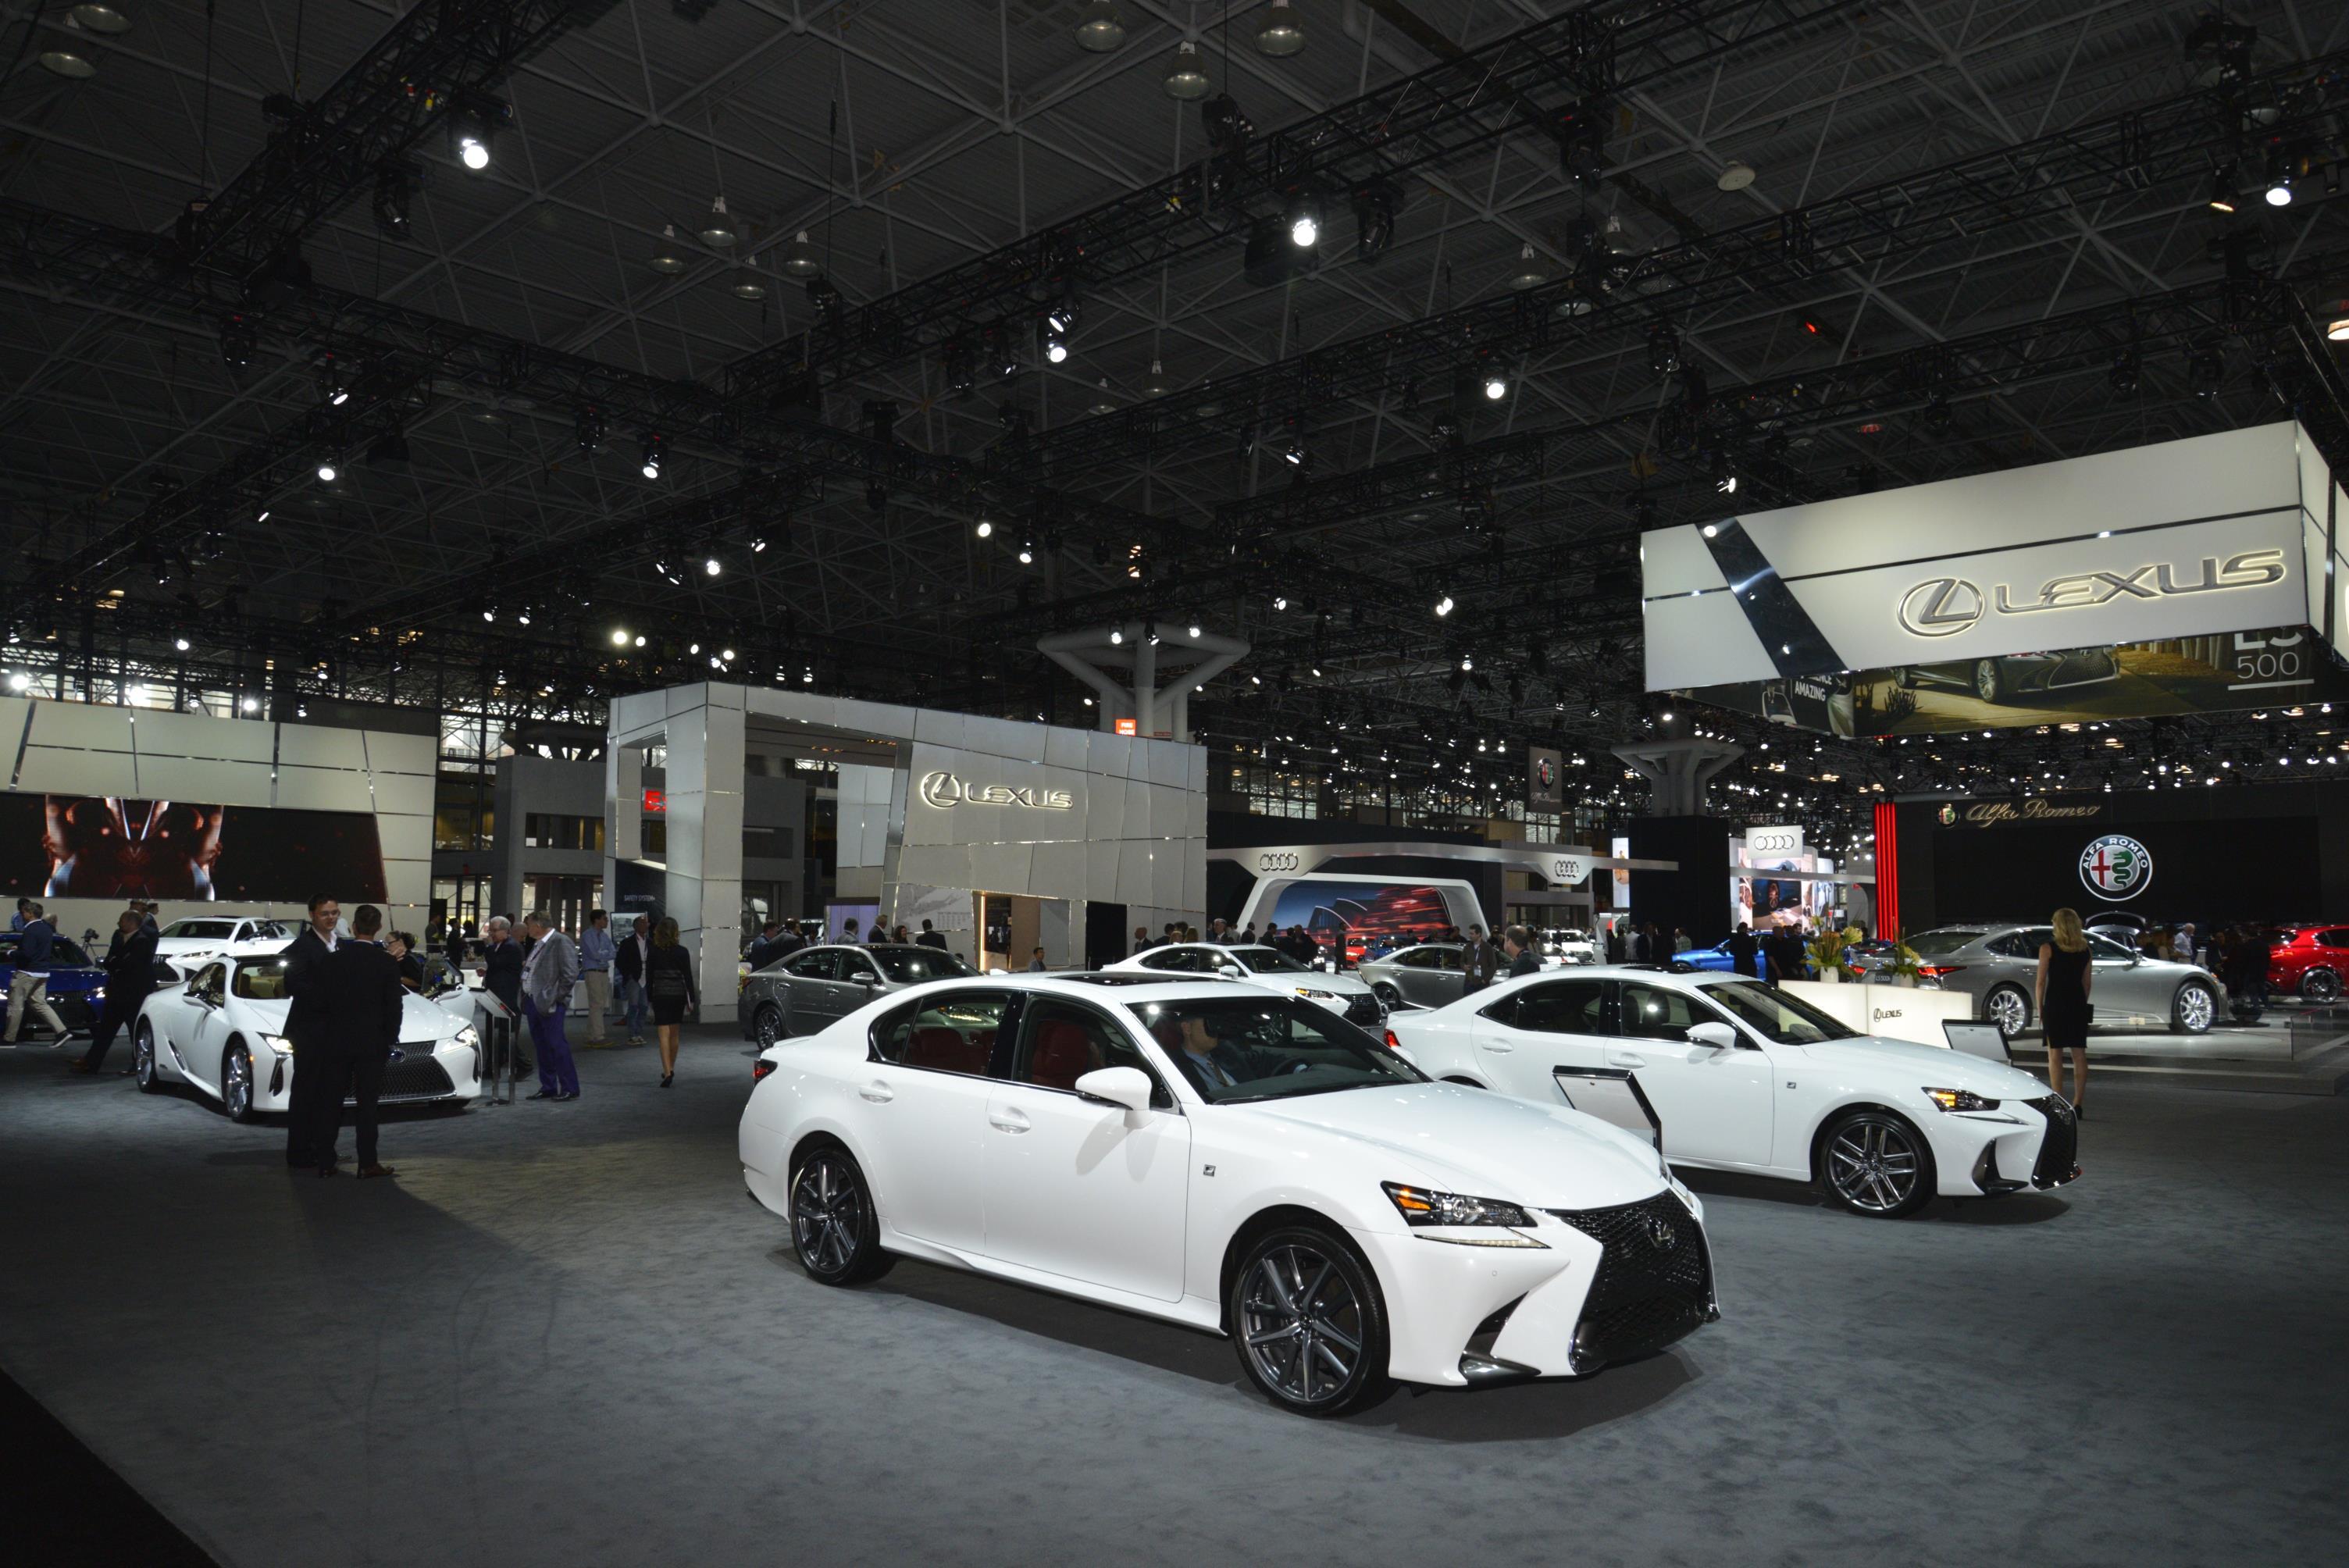 New York Auto Show 2017 (219)